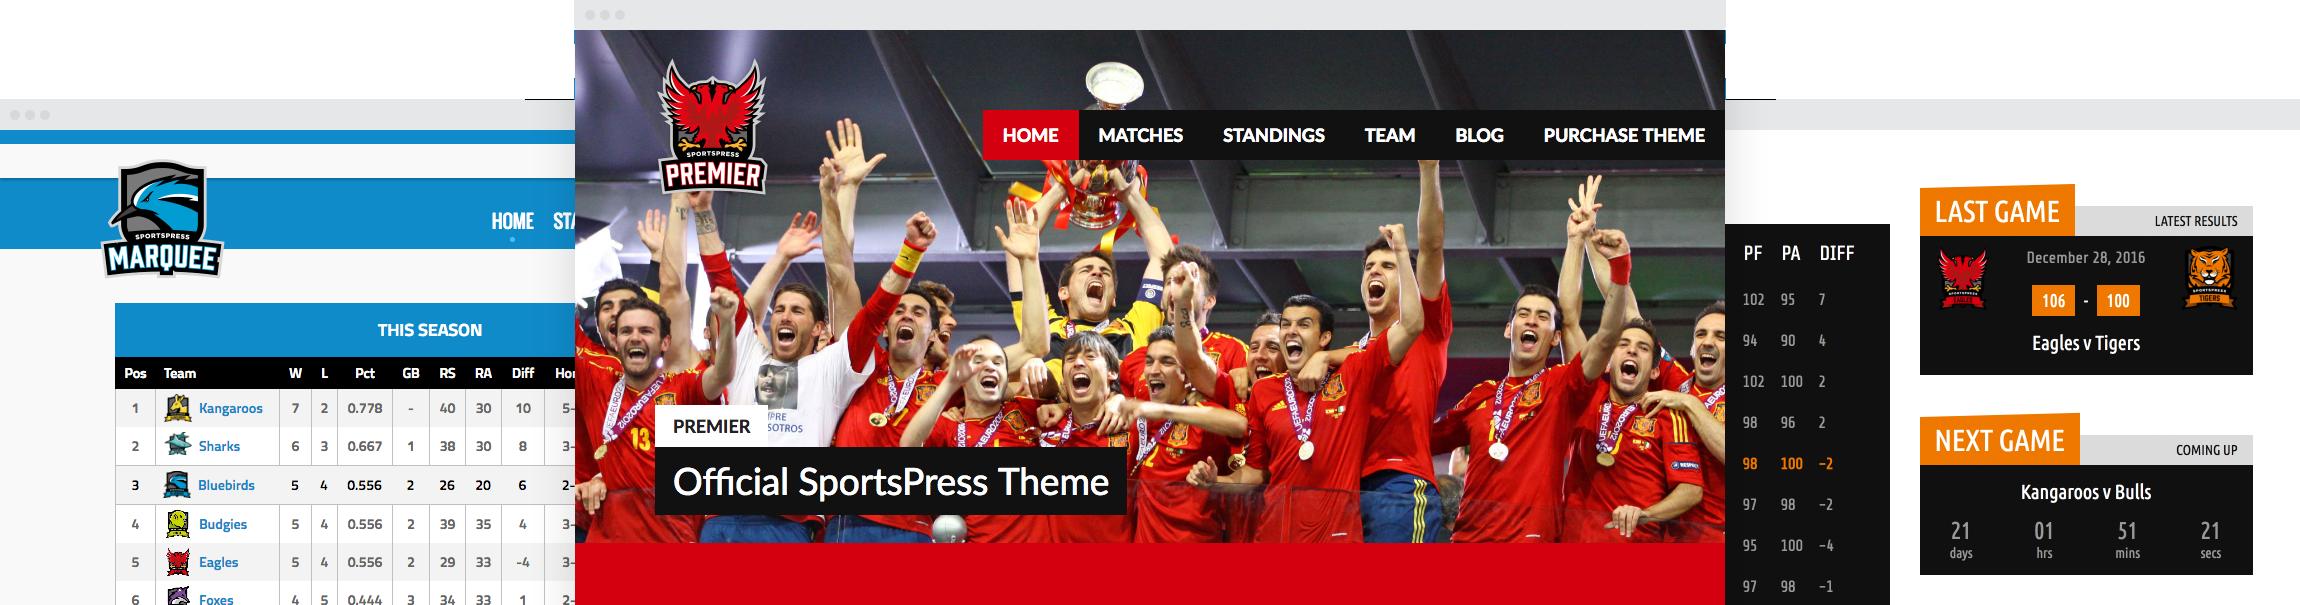 Premium SportsPress Themes by ThemeBoy